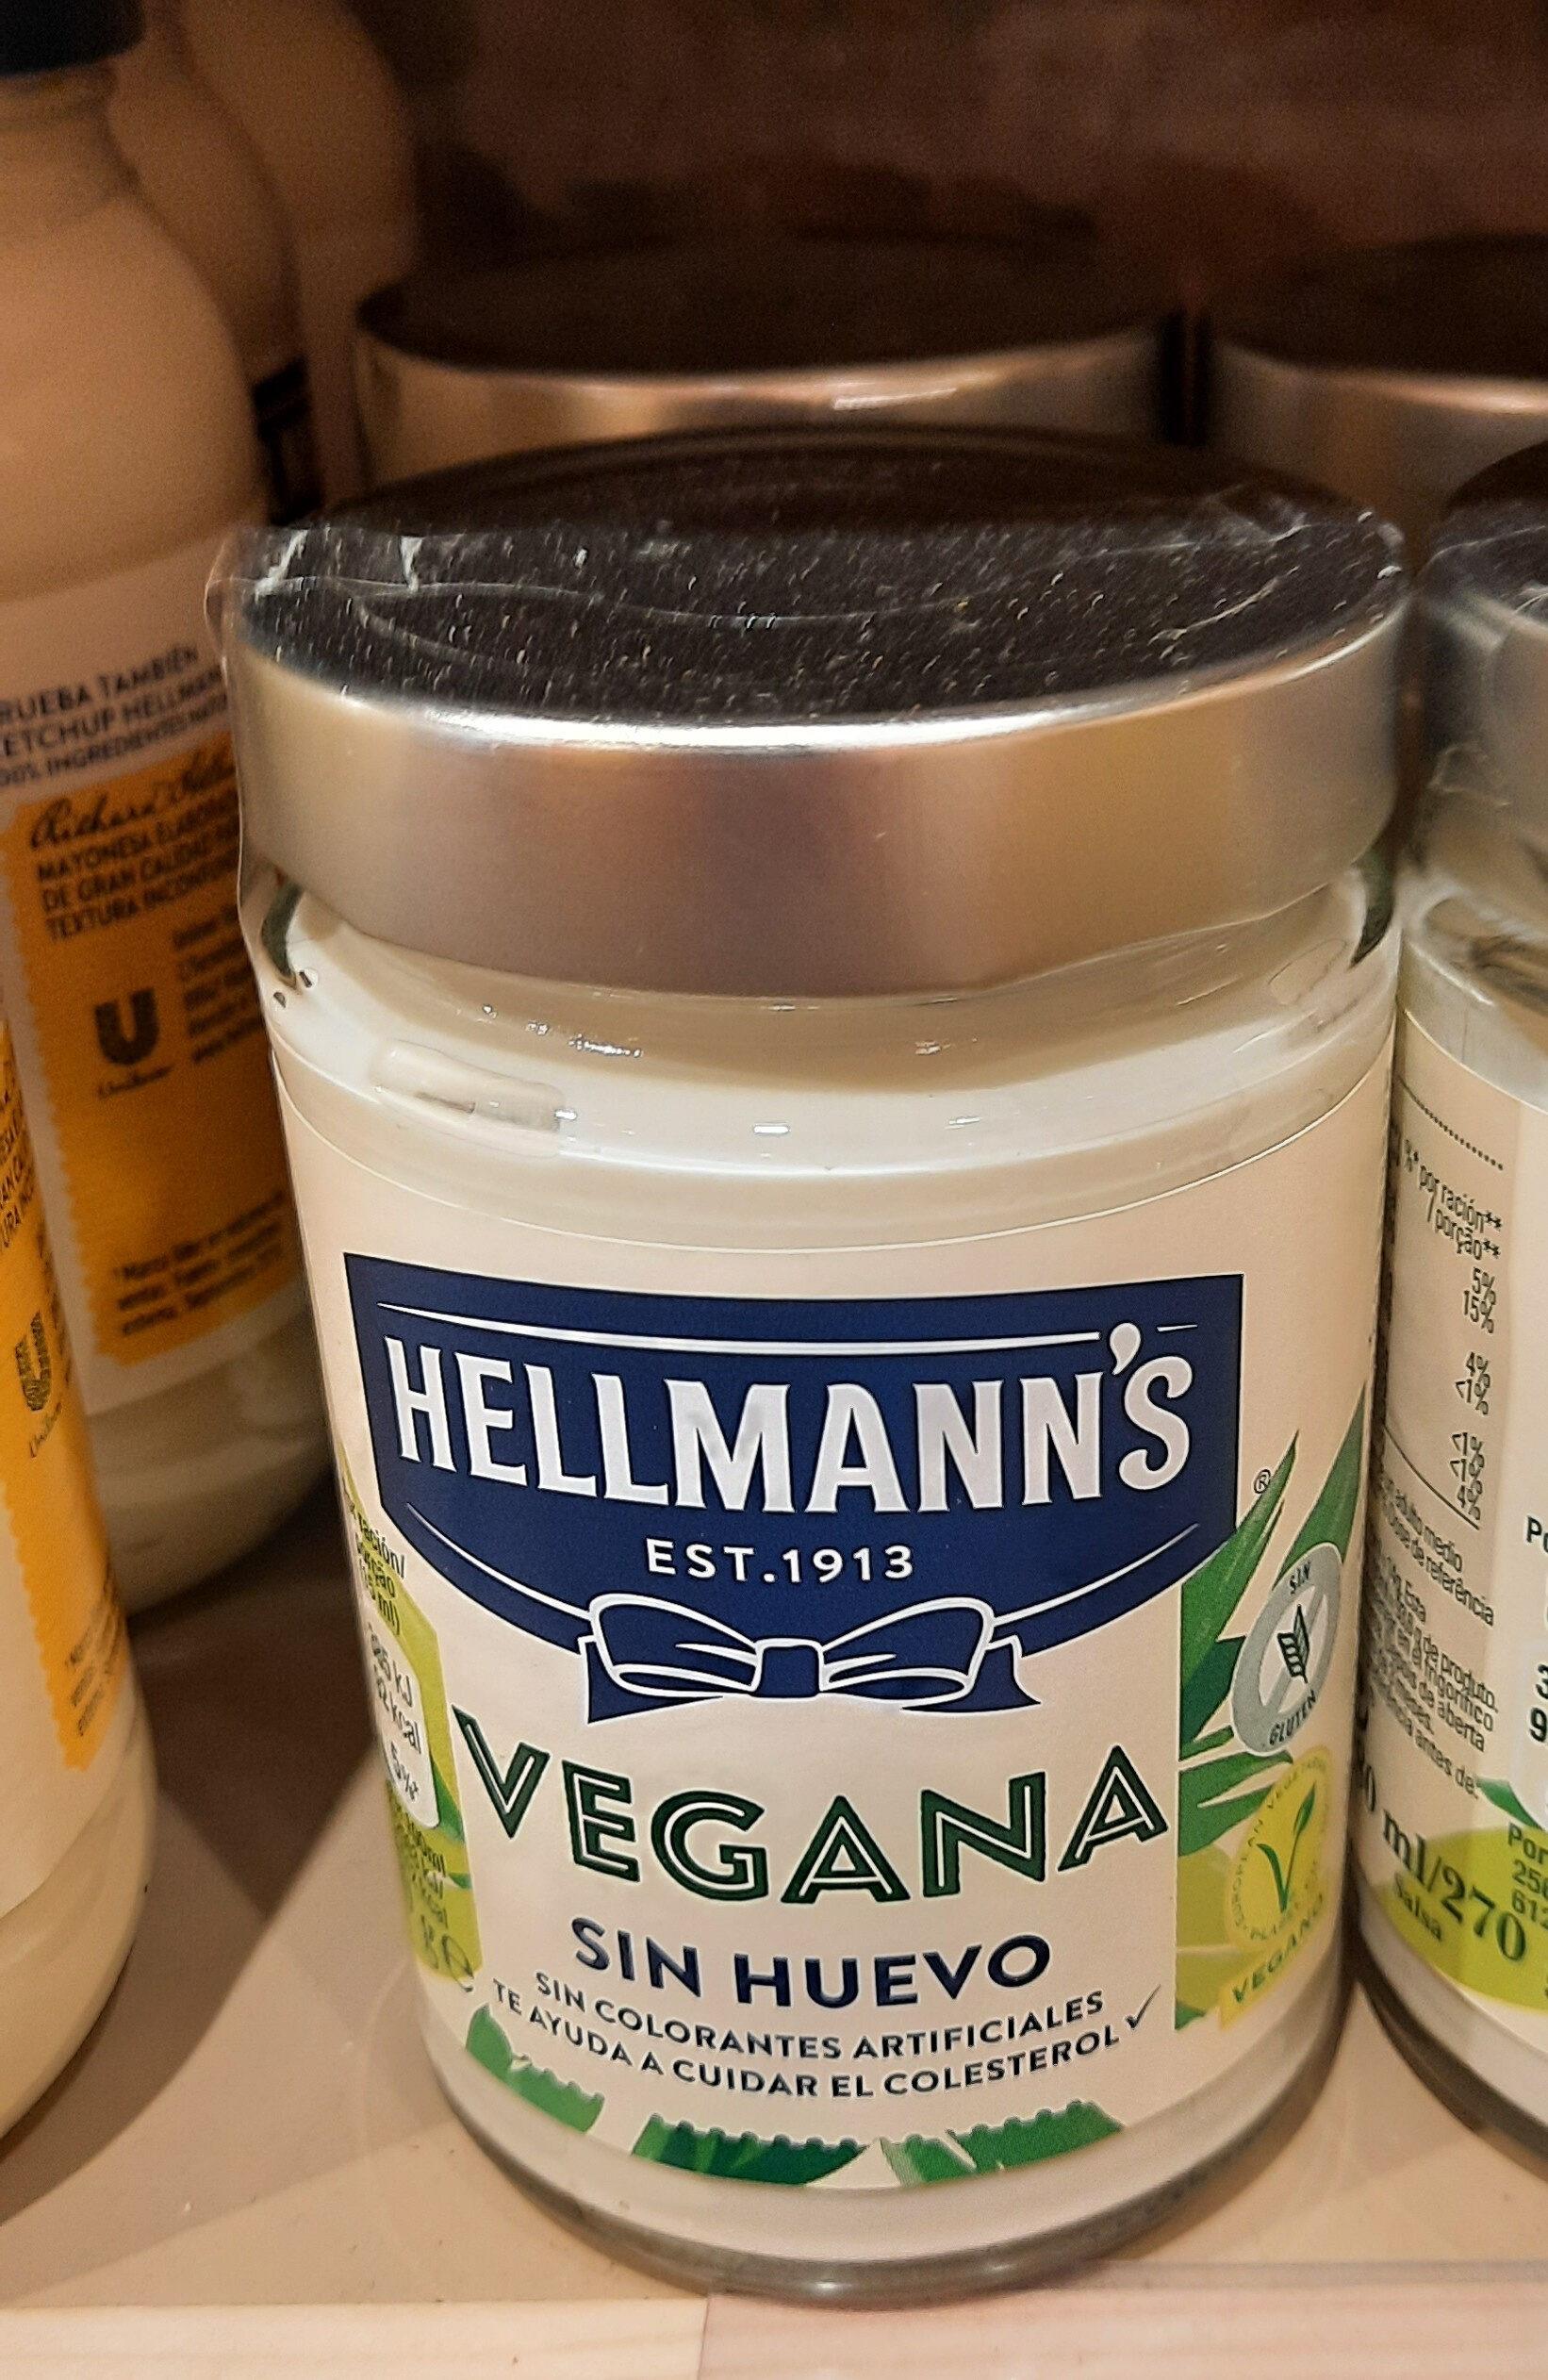 Vegana sin huevo - Producte - ca